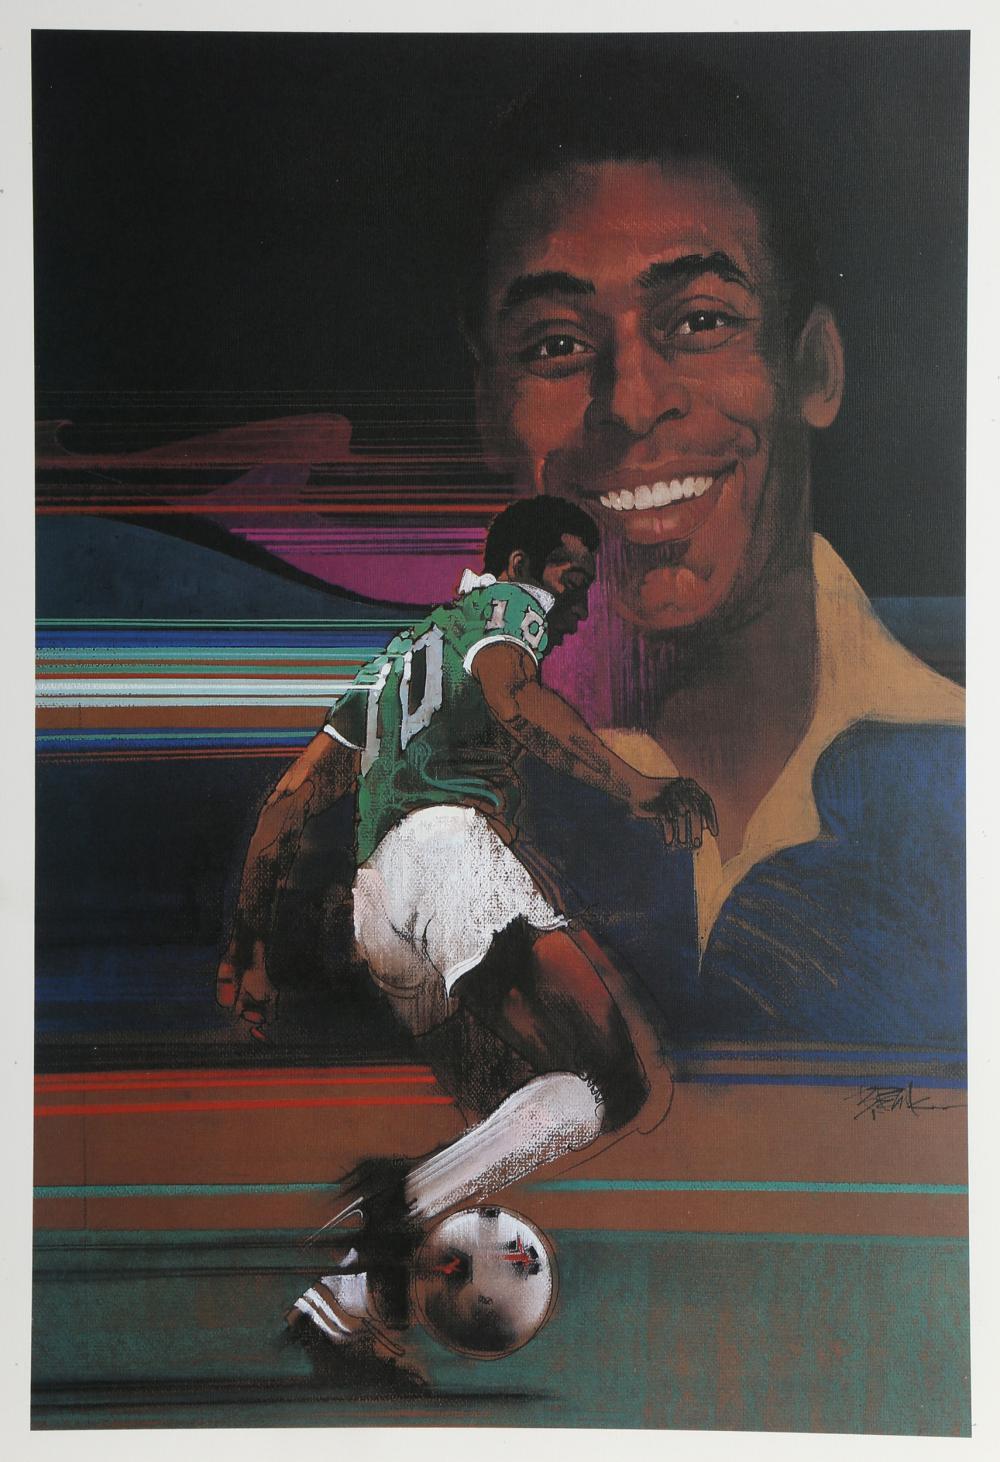 Robert Peak, Pele from Sports Illustrated Living Legends Portfolio, Lithograph